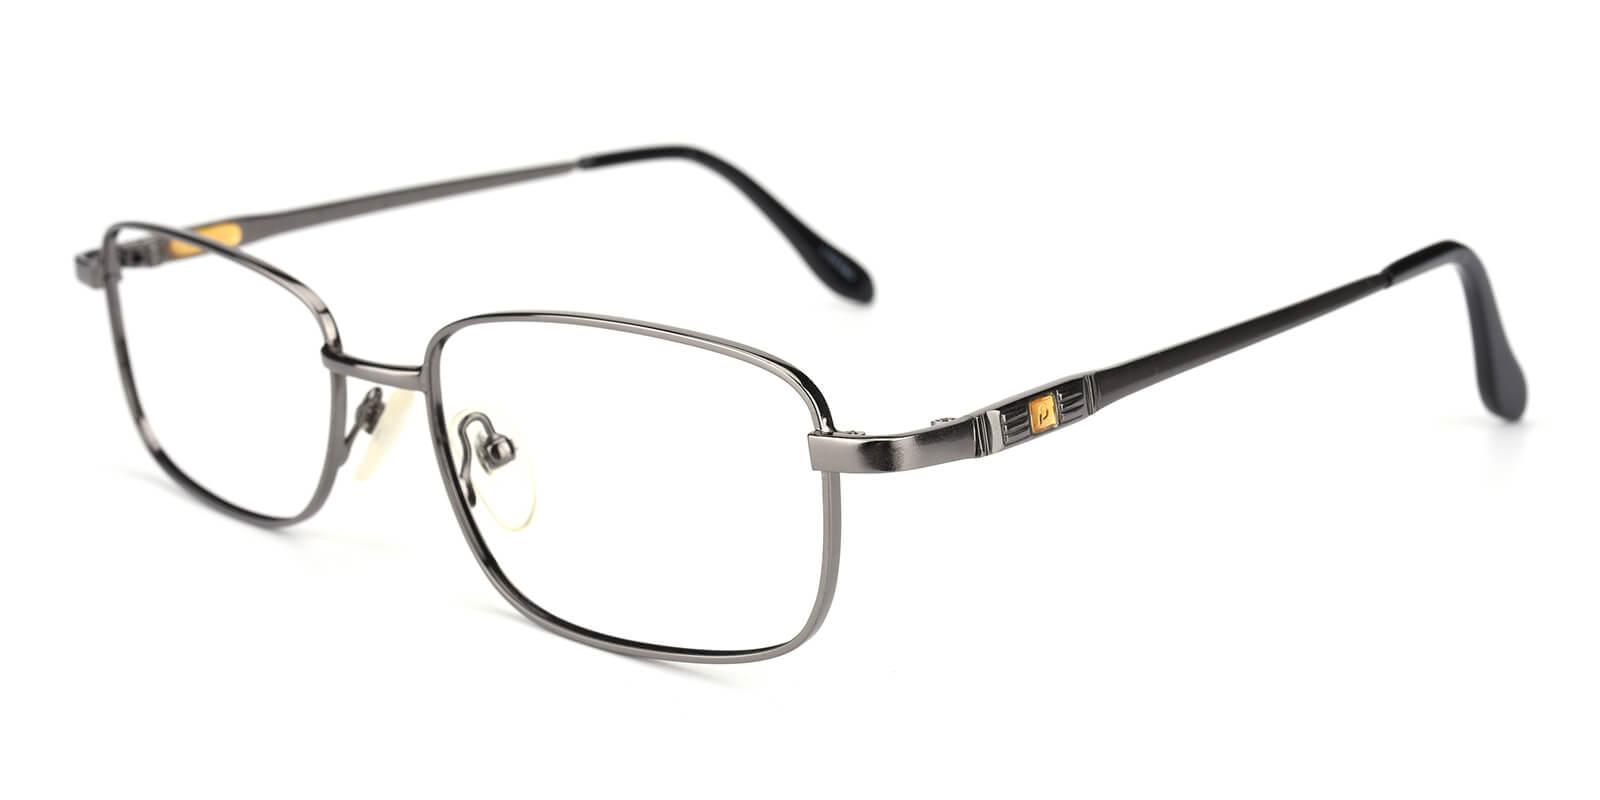 Michelly-Gun-Rectangle-Metal-Eyeglasses-additional1